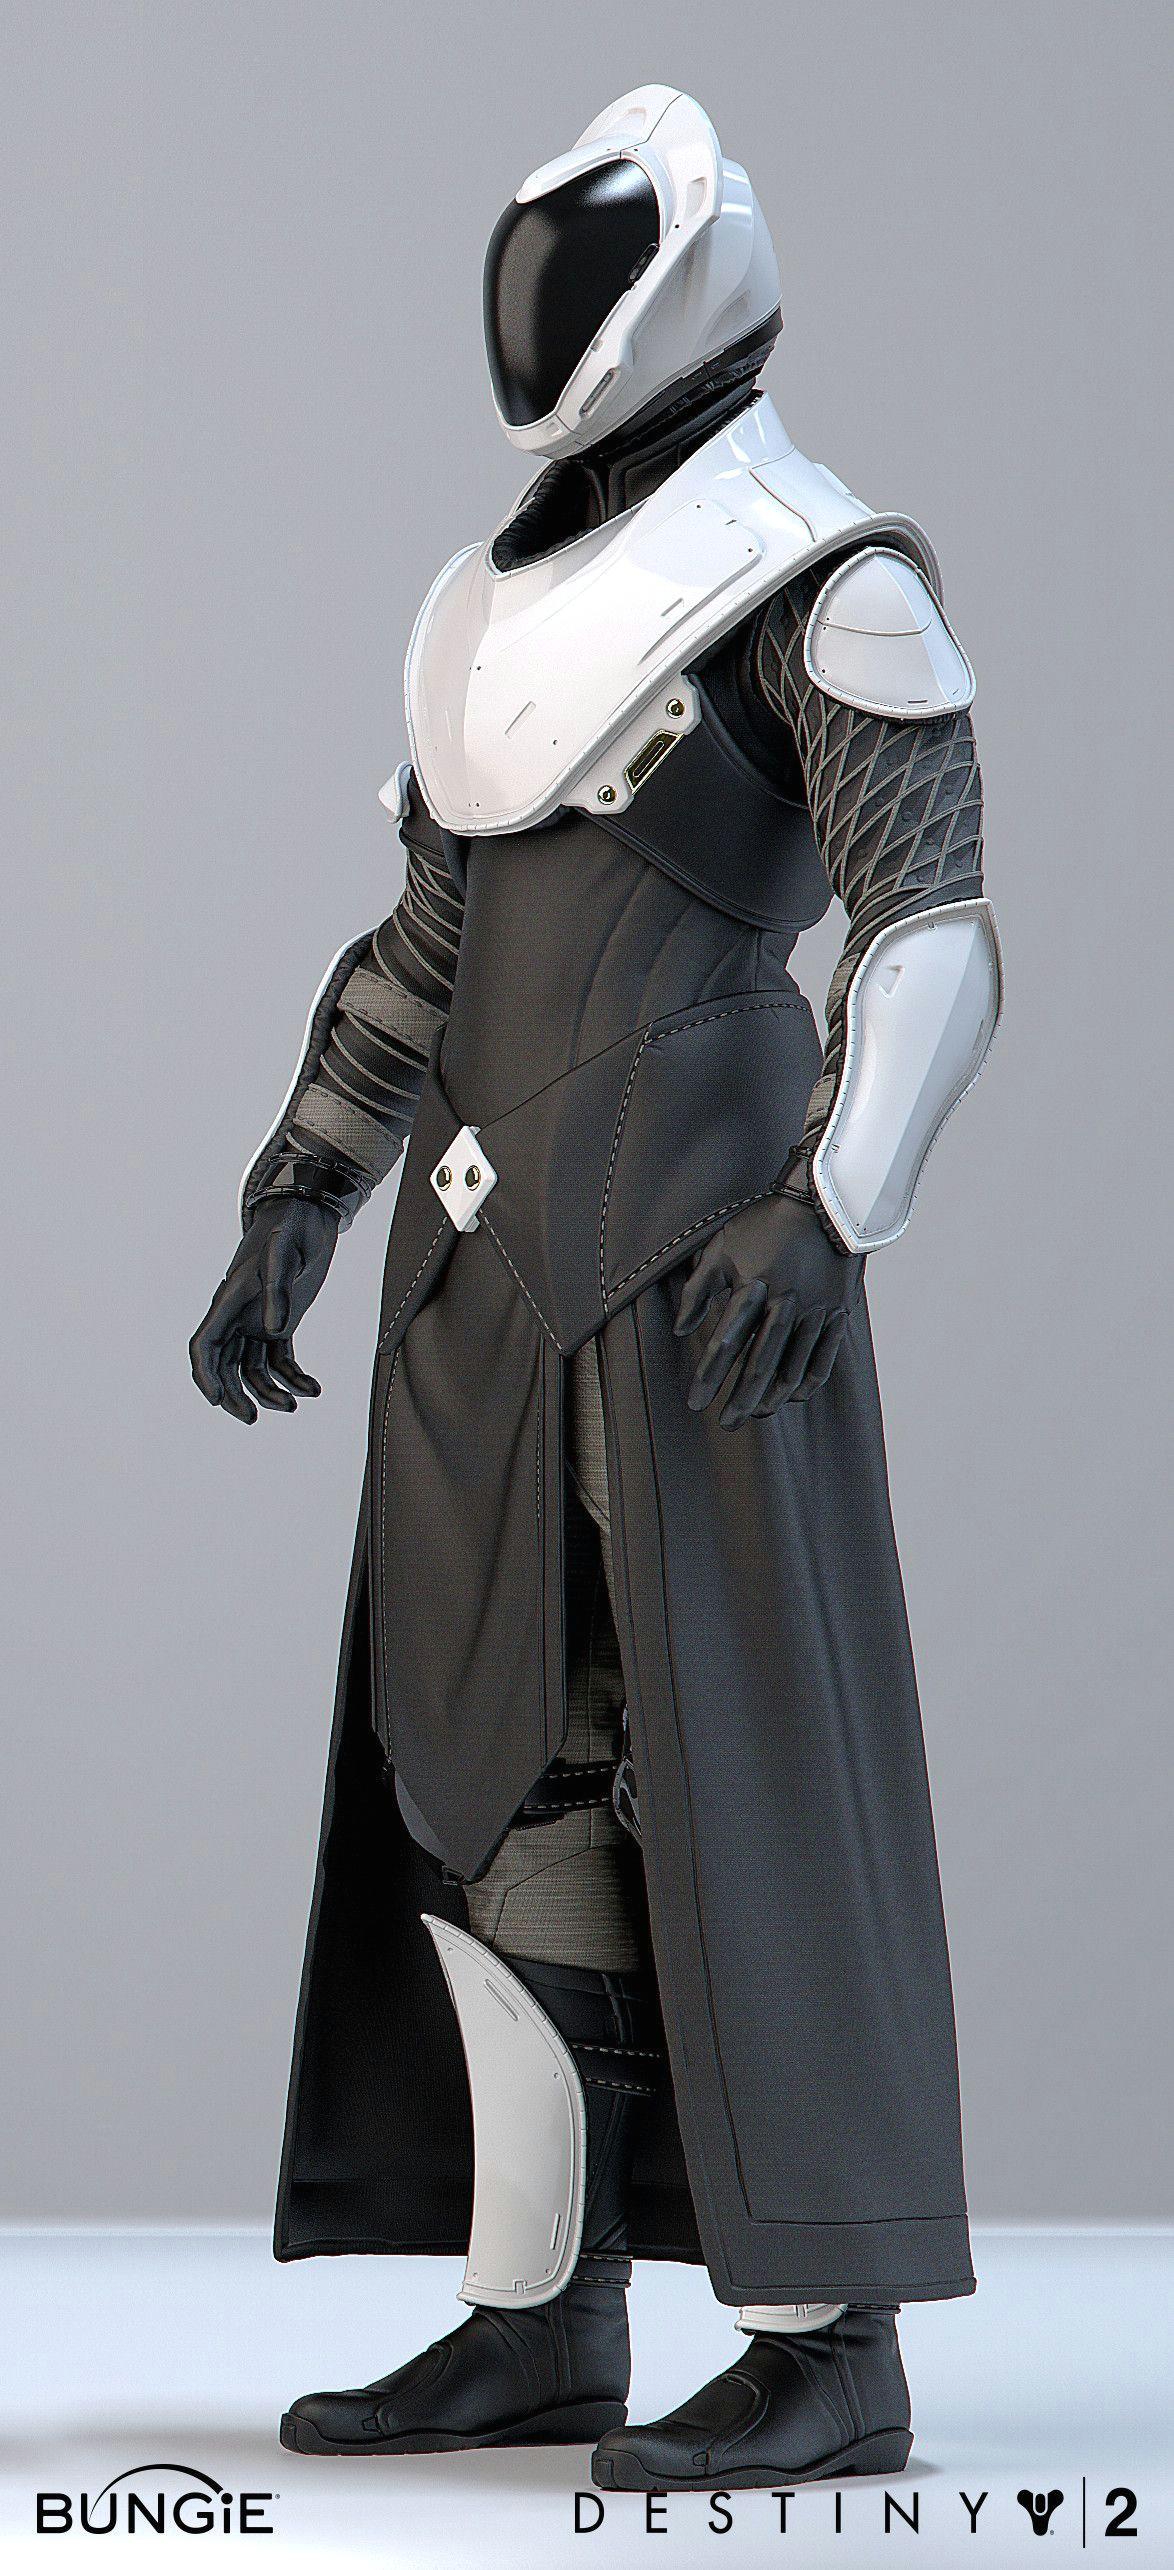 artstation destiny 2 io gensym knight warlock gear roderick weise